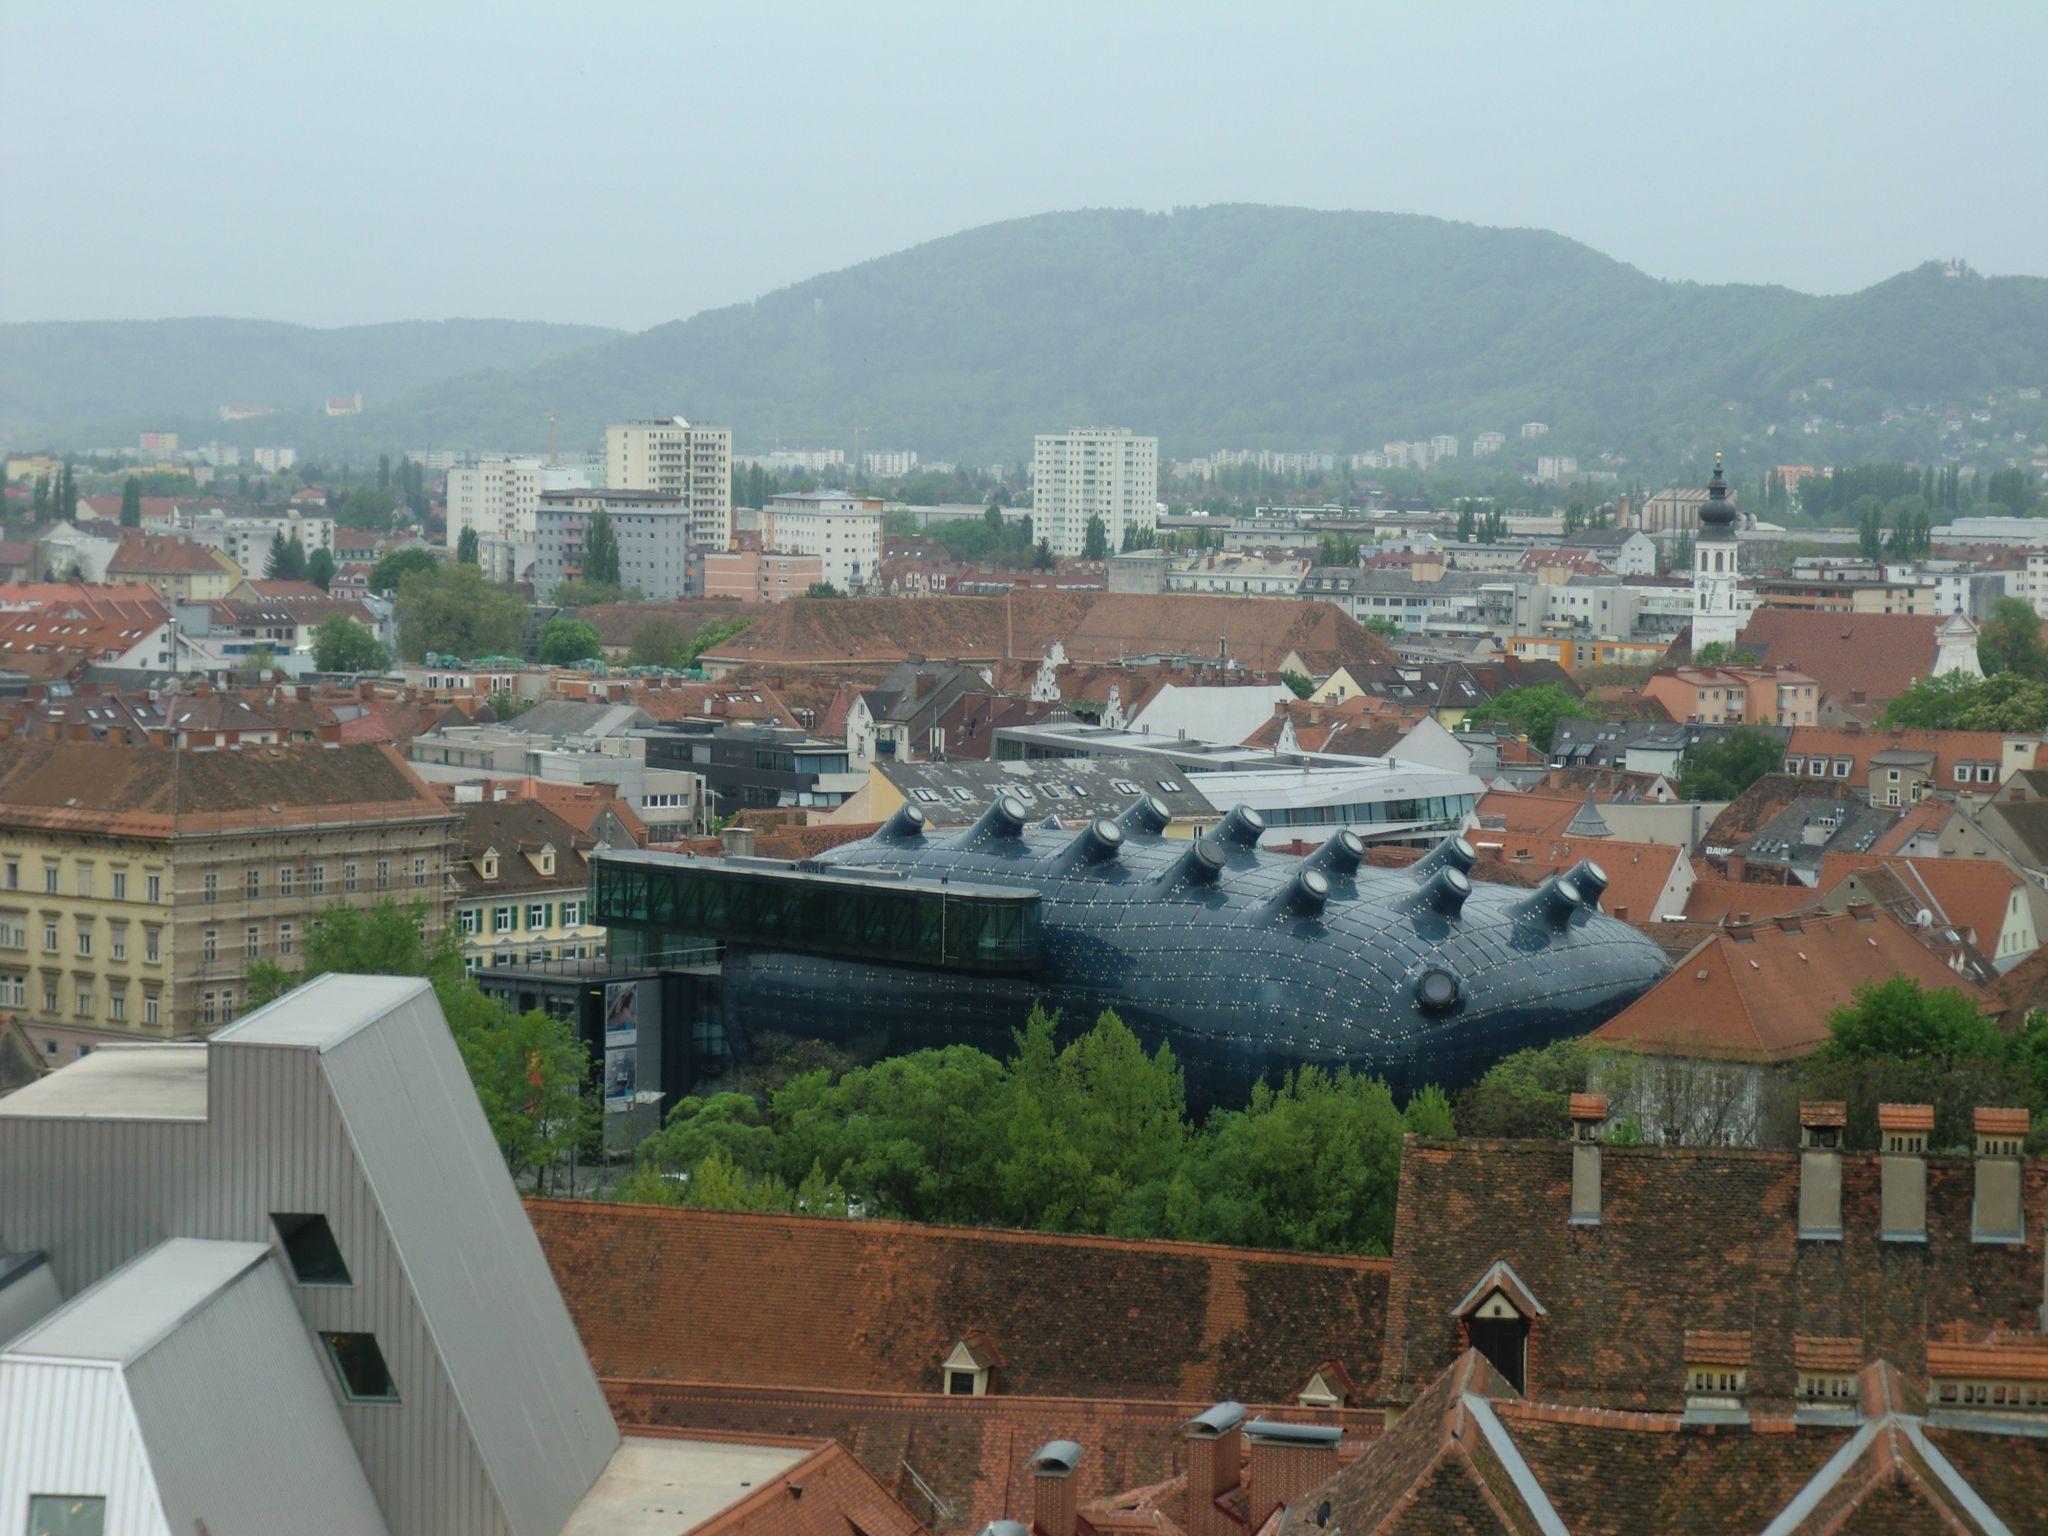 Graz alien top - Graz: tradition and modernity